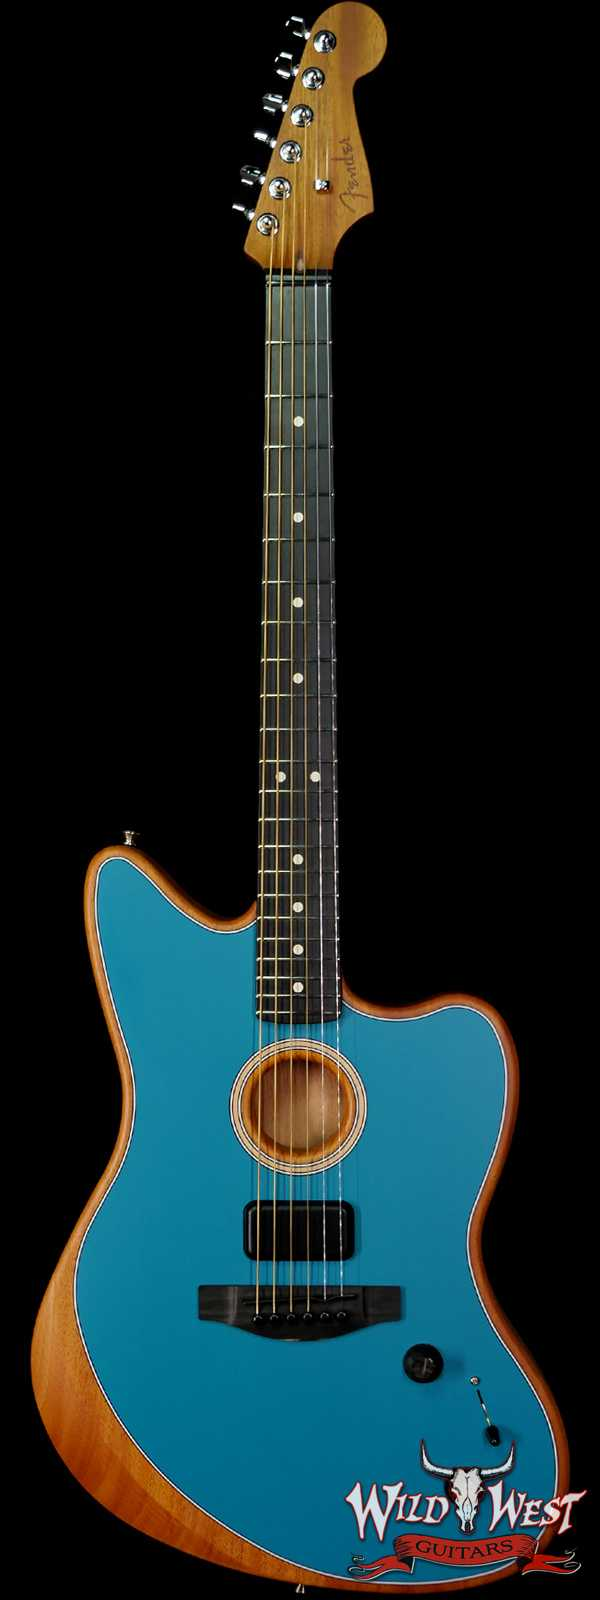 Fender American Acoustasonic Jazzmaster Ebony Fingerboard Ocean Turquoise